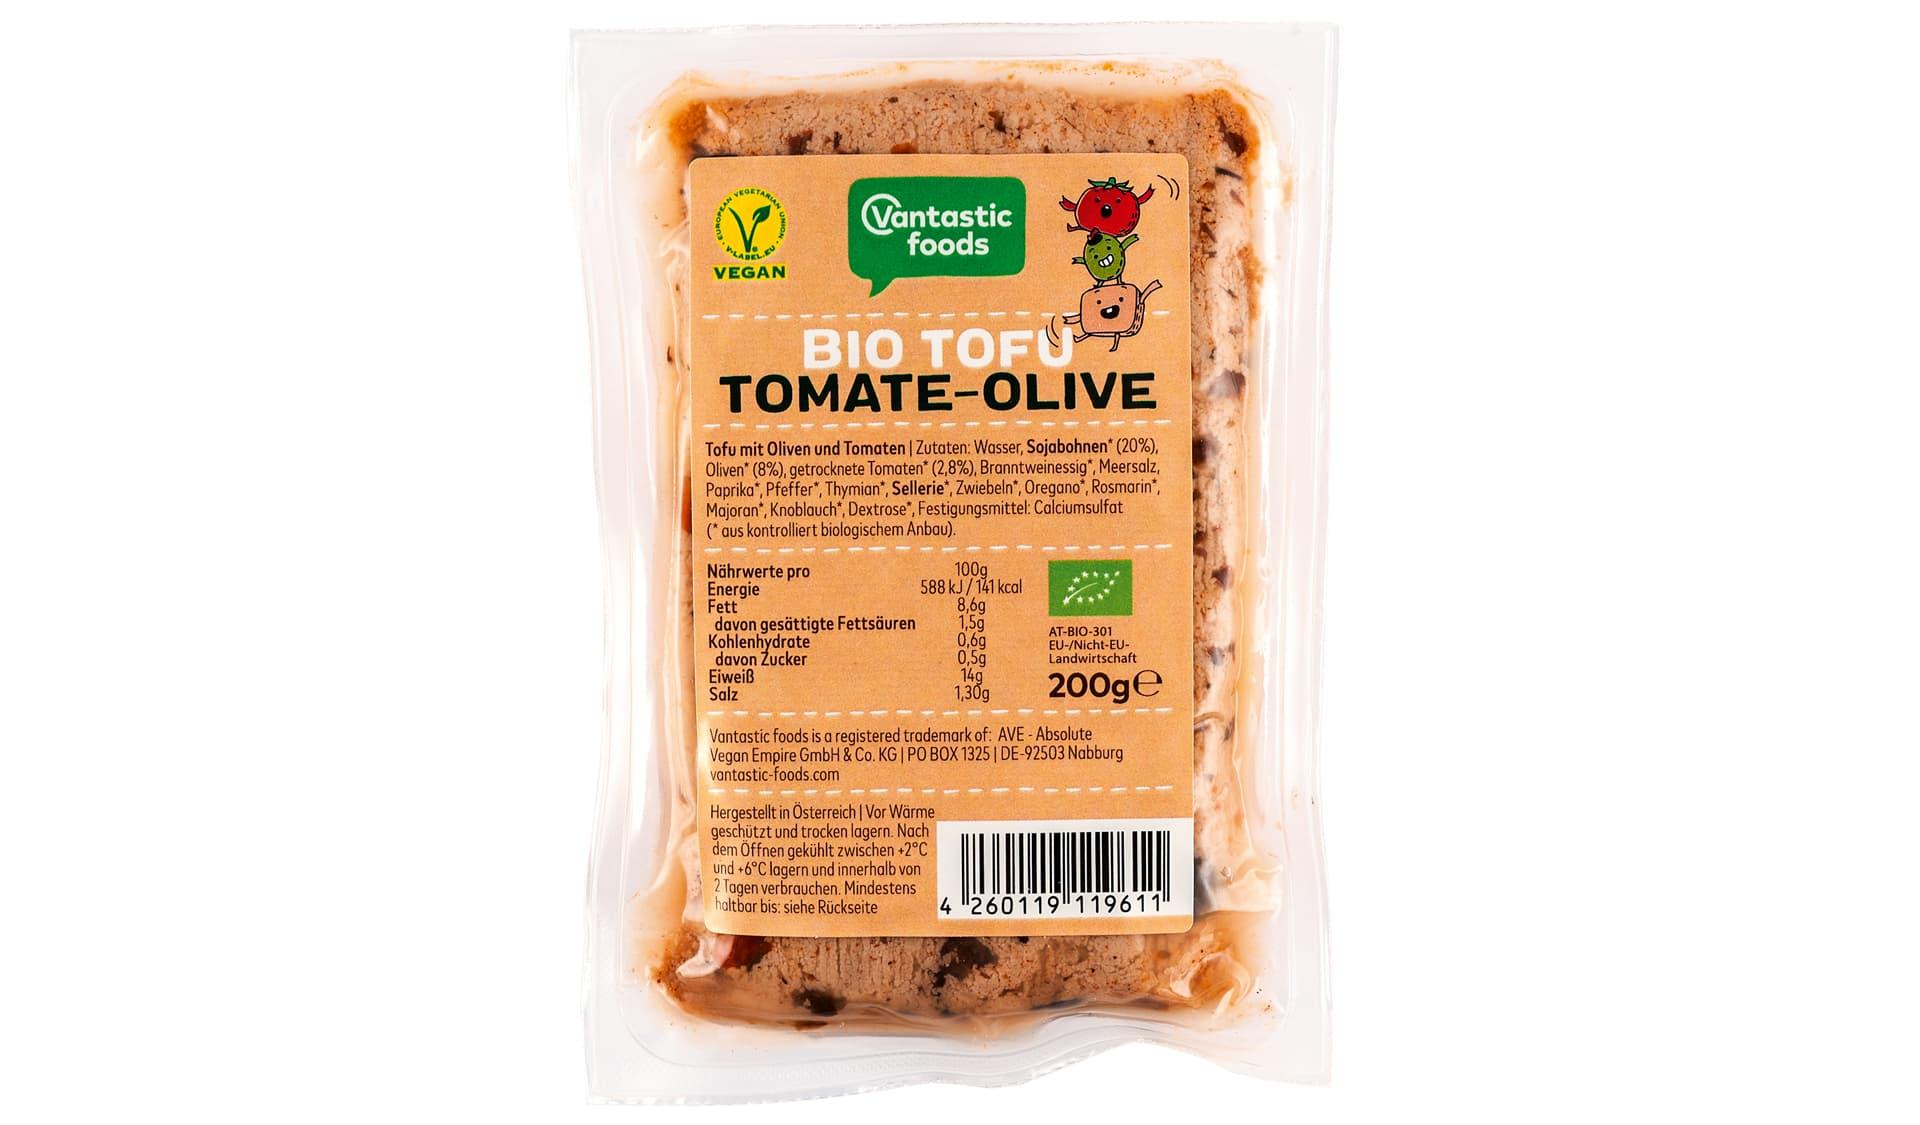 Vantastic Bio Tofu Tomate-Olive (www.vantastic-foods.com)